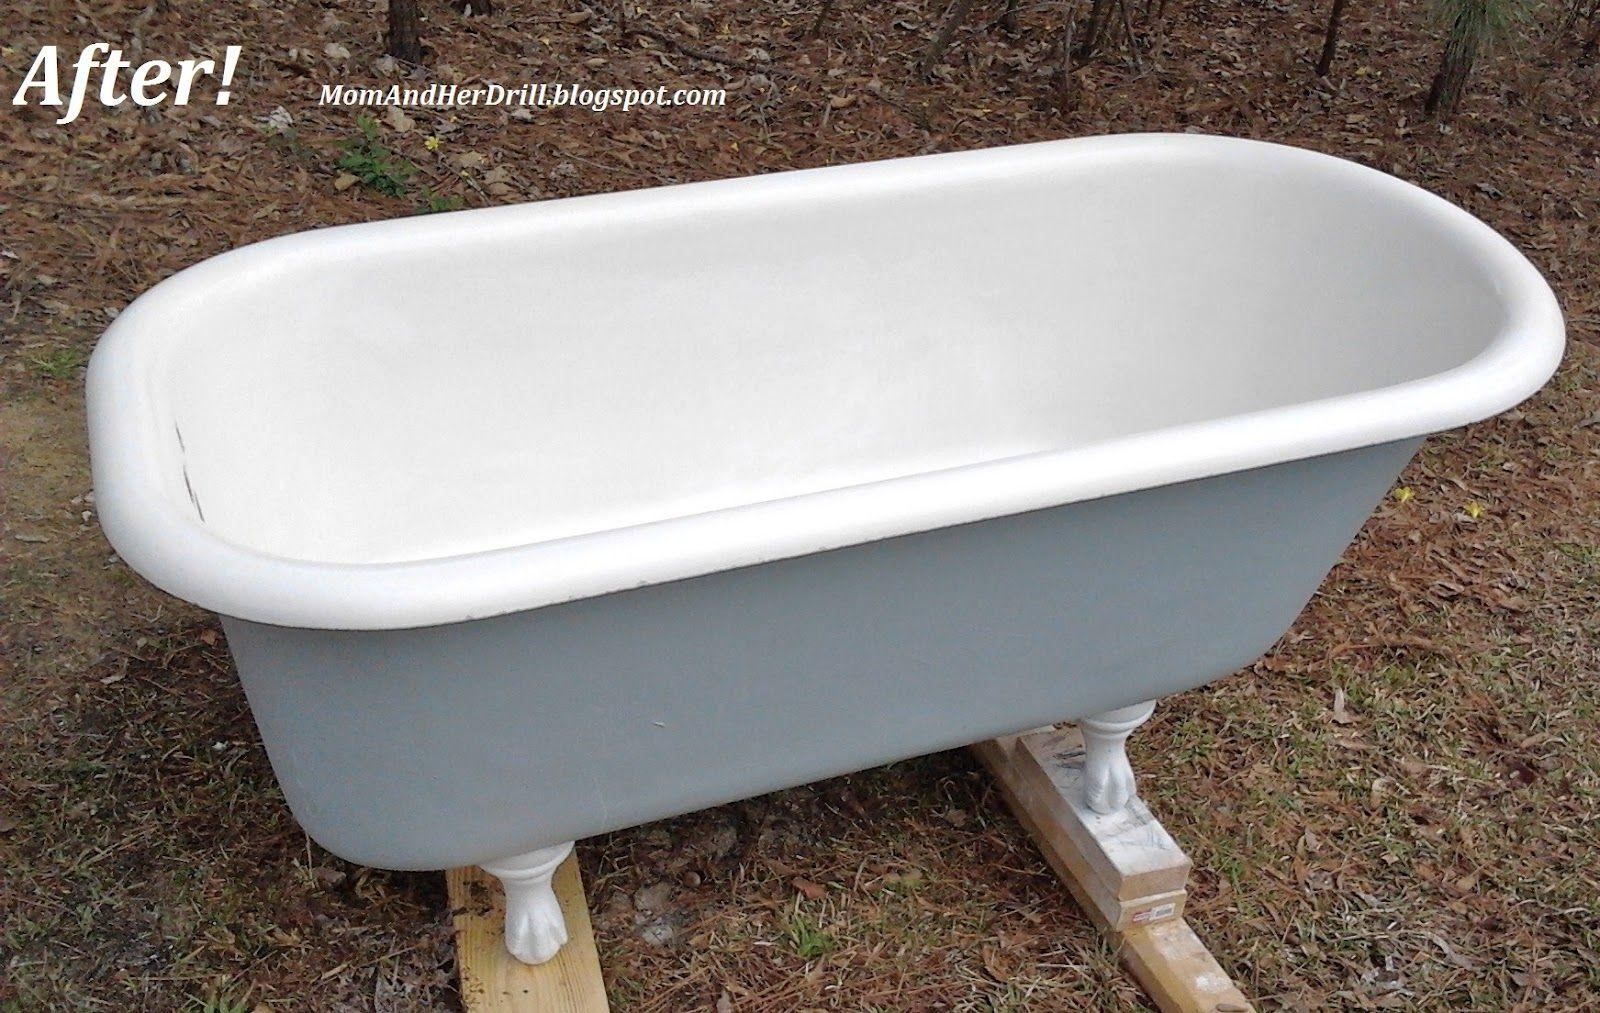 Refinishing the Porcelain Tub & Sinks: The bottle that fixed ...